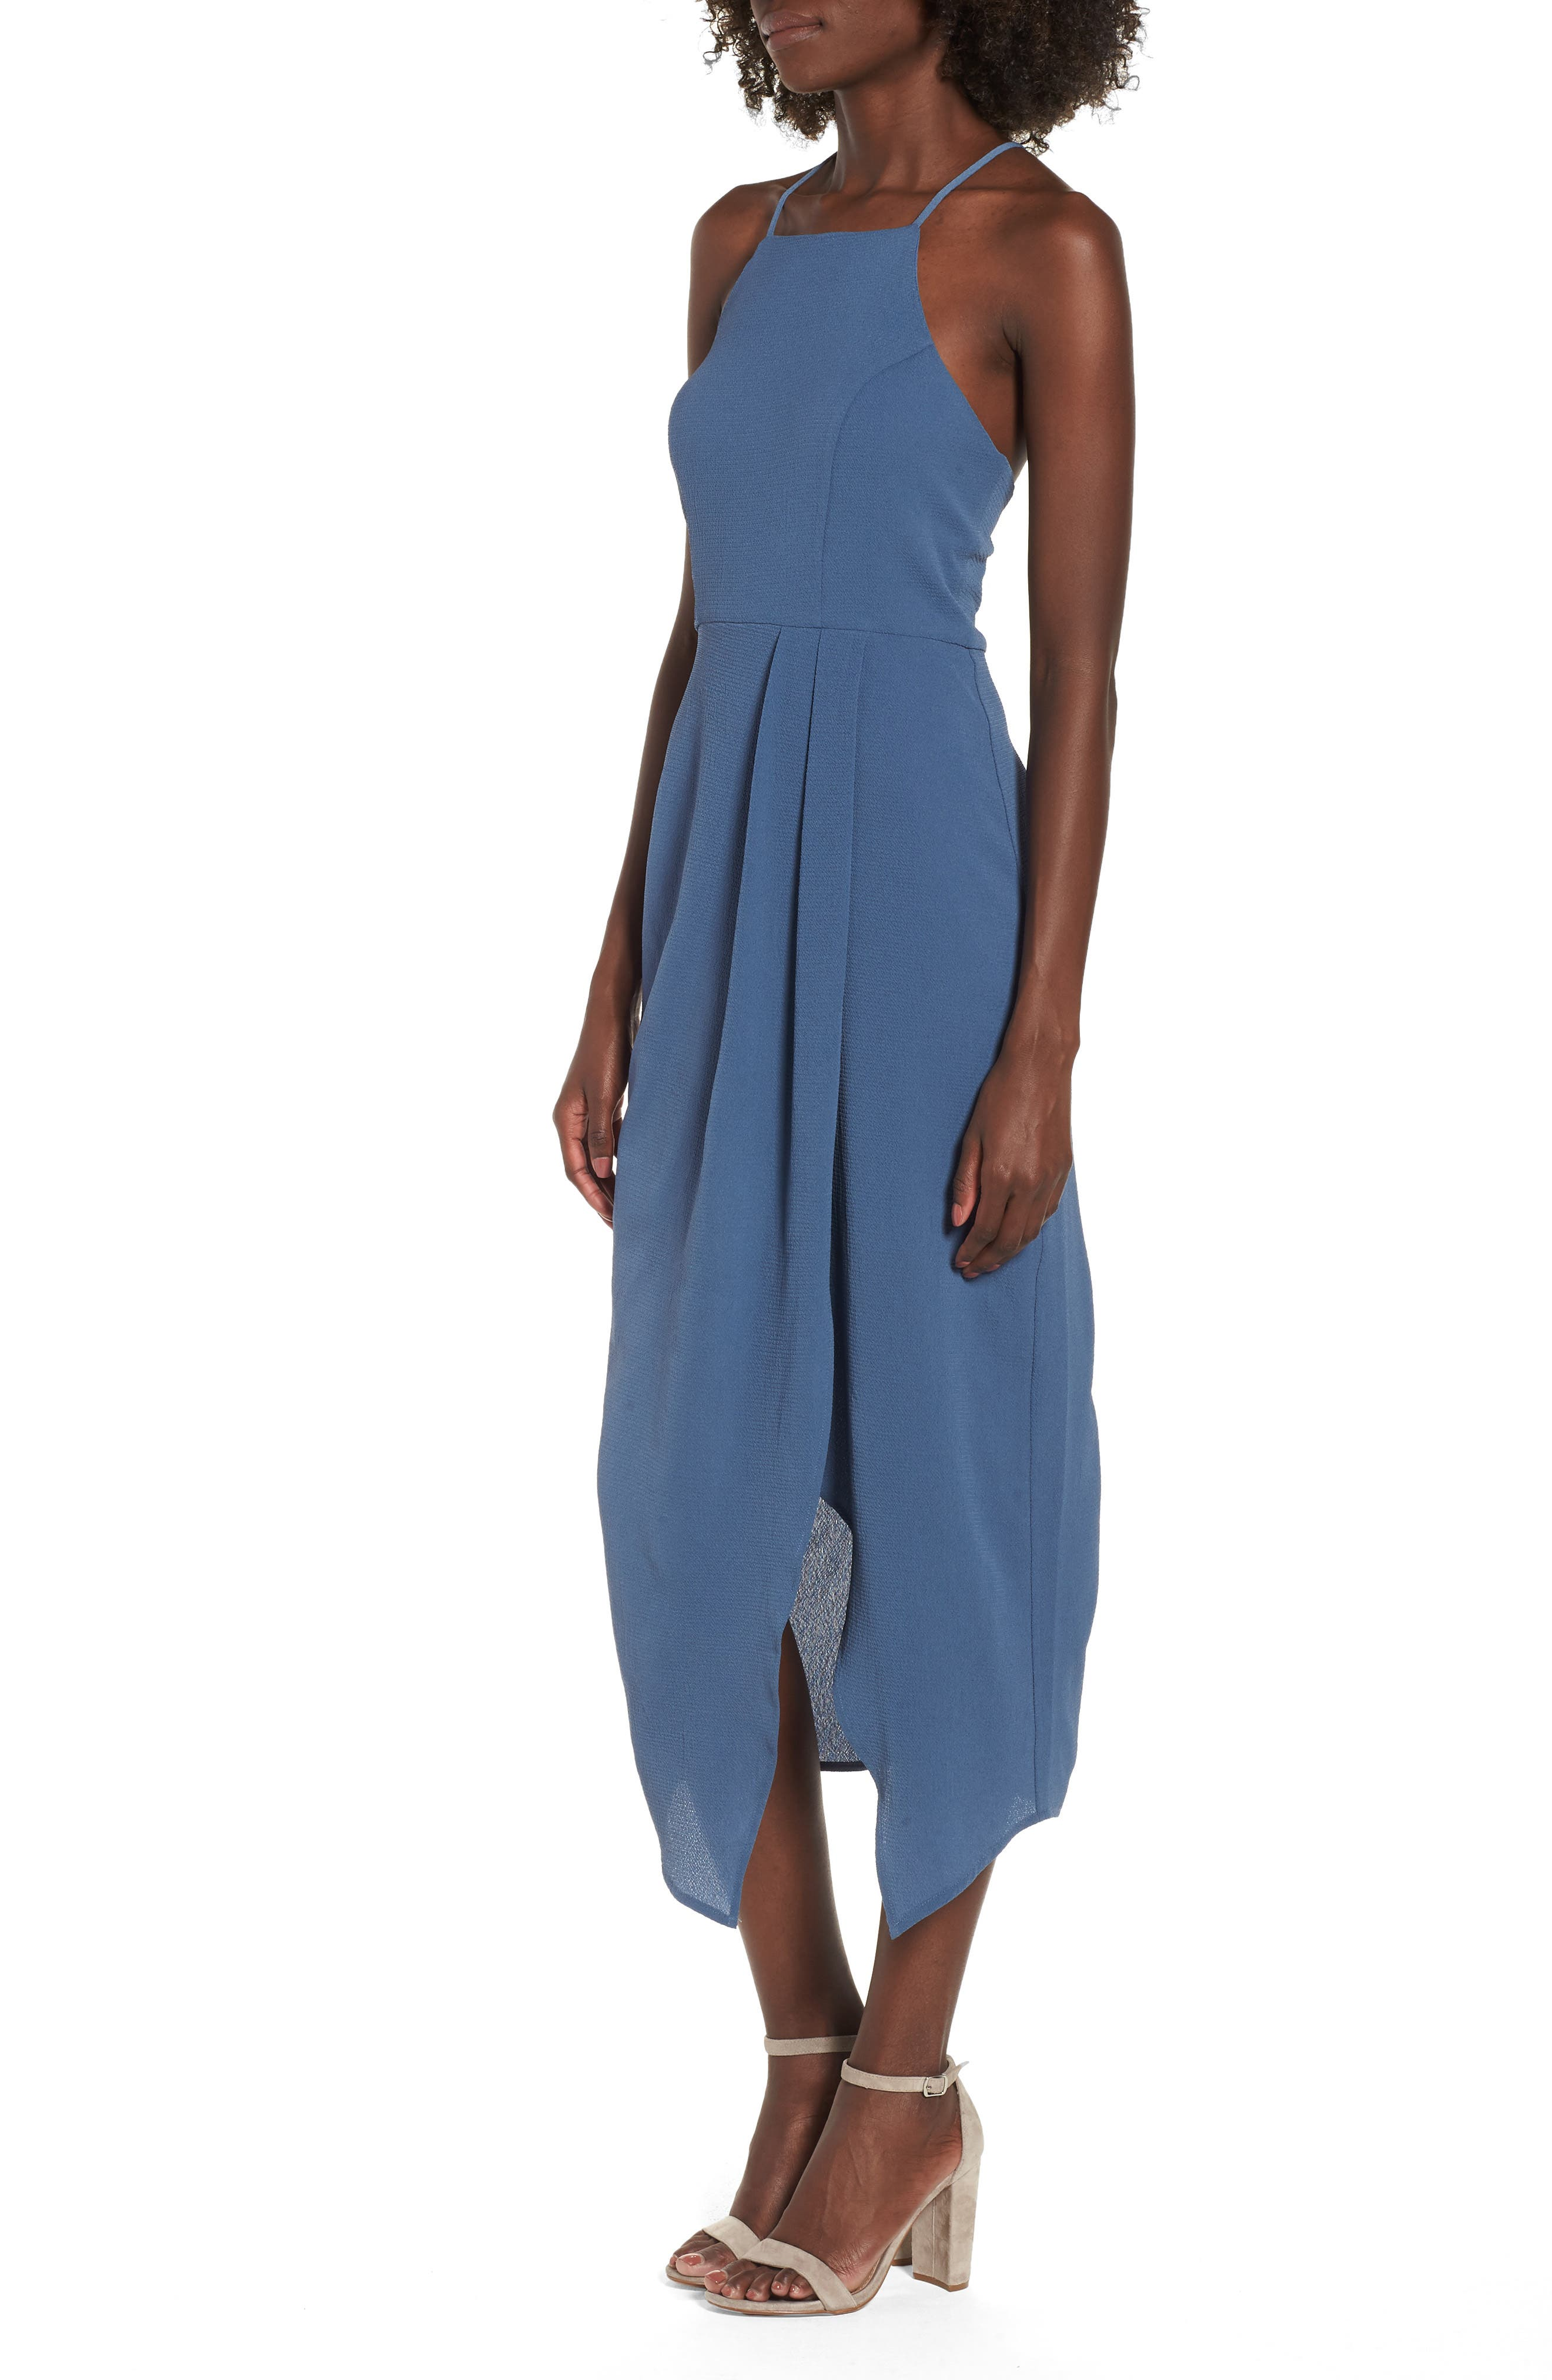 Wrap Midi Dress,                             Alternate thumbnail 3, color,                             Dusty Teal